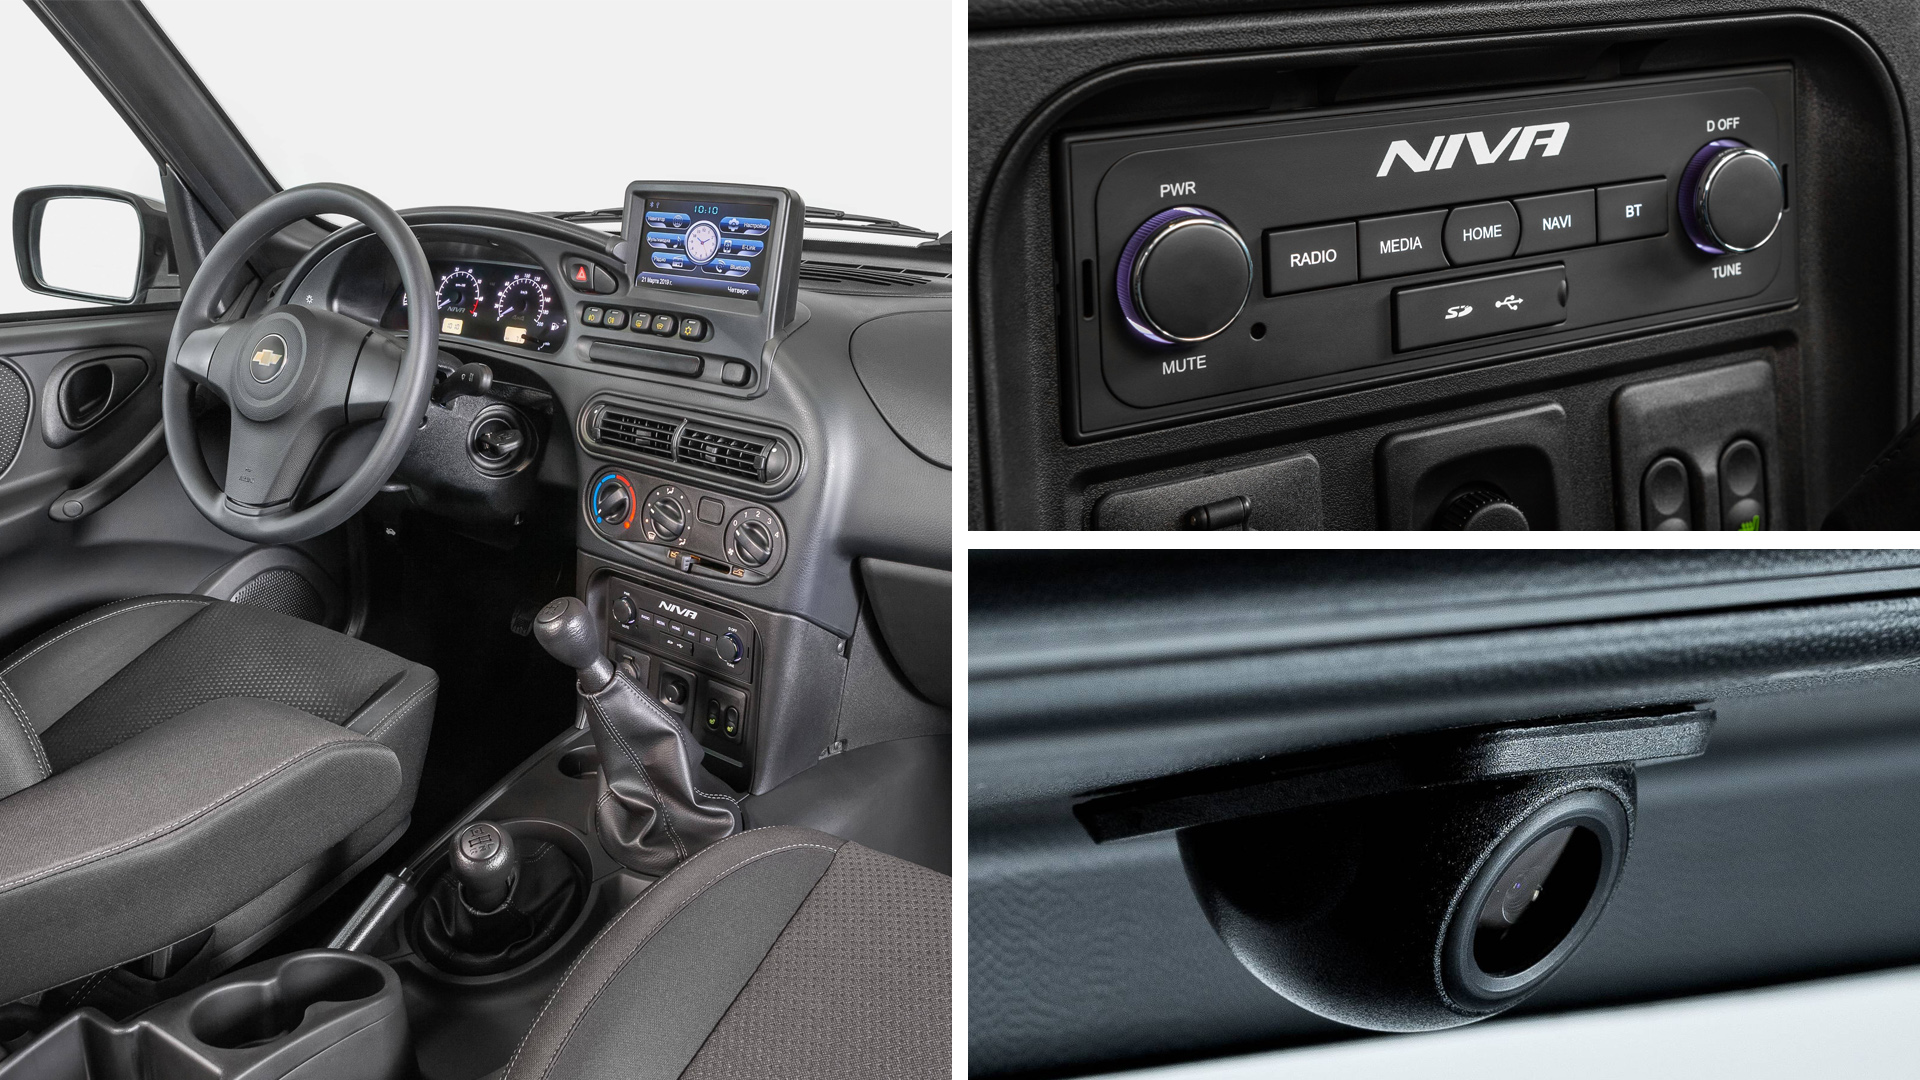 Chevrolet Niva GLC Multimedia